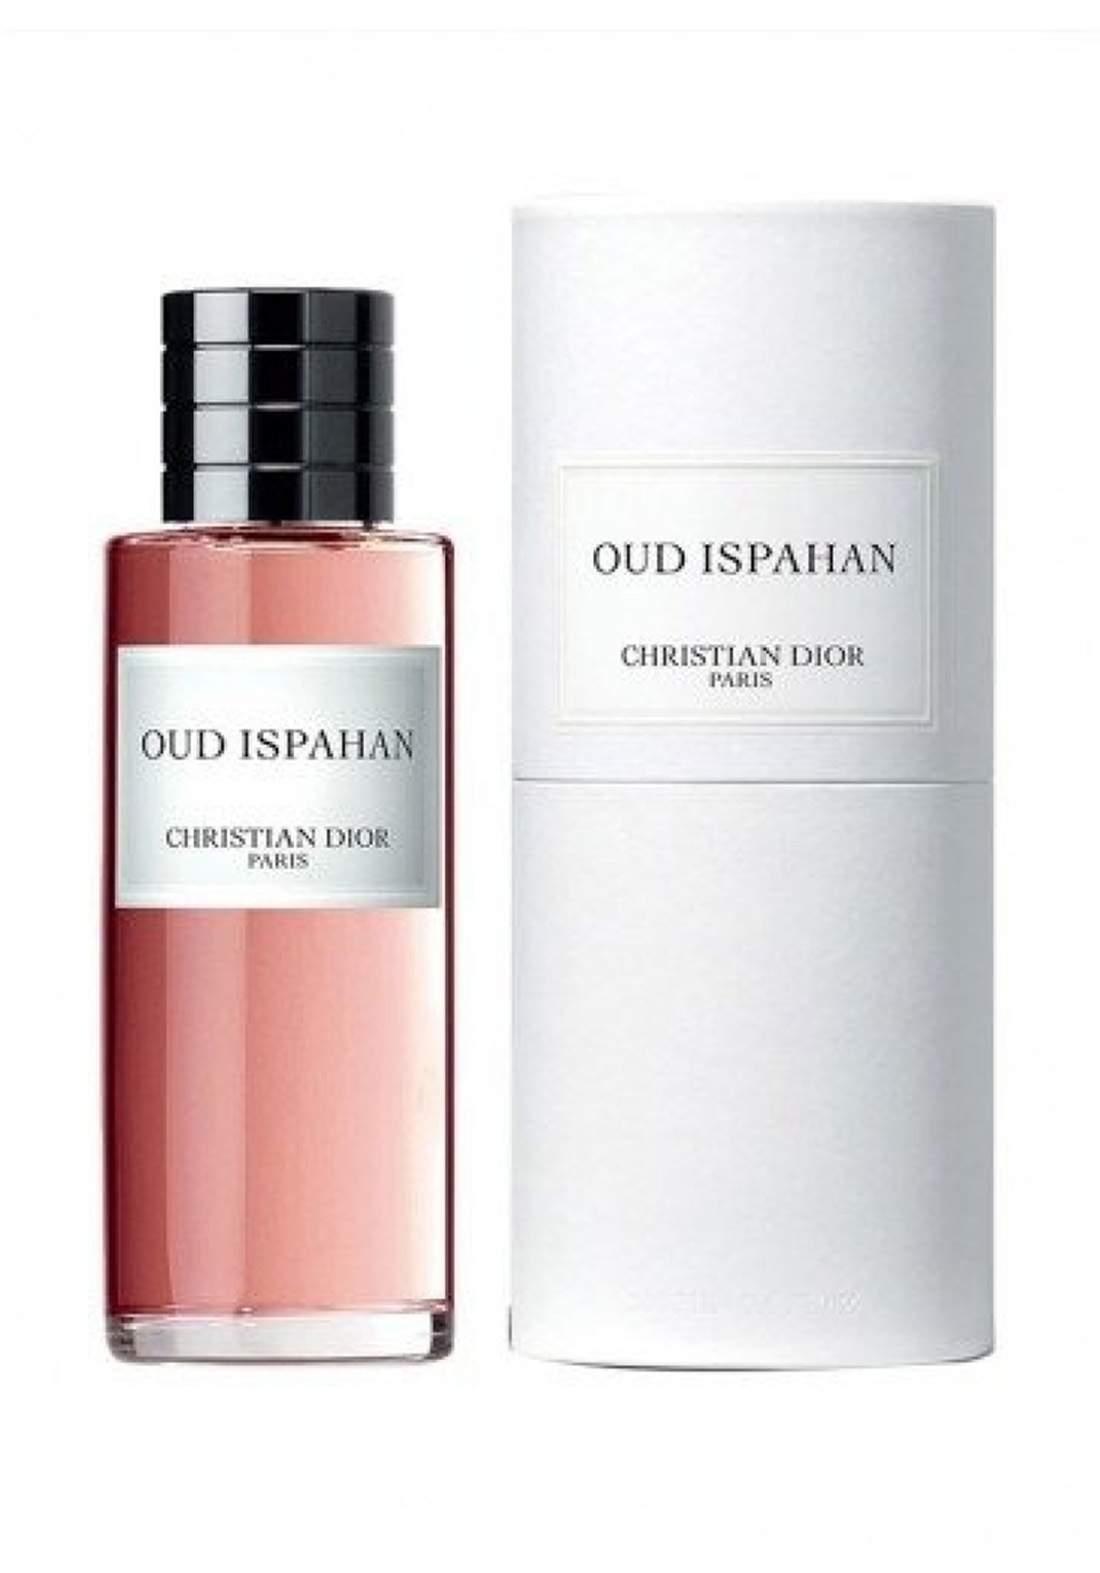 Christian Dior Oud Ispahan Eau de Parfum For Unisex 250ml عطر لكلا الجنسين